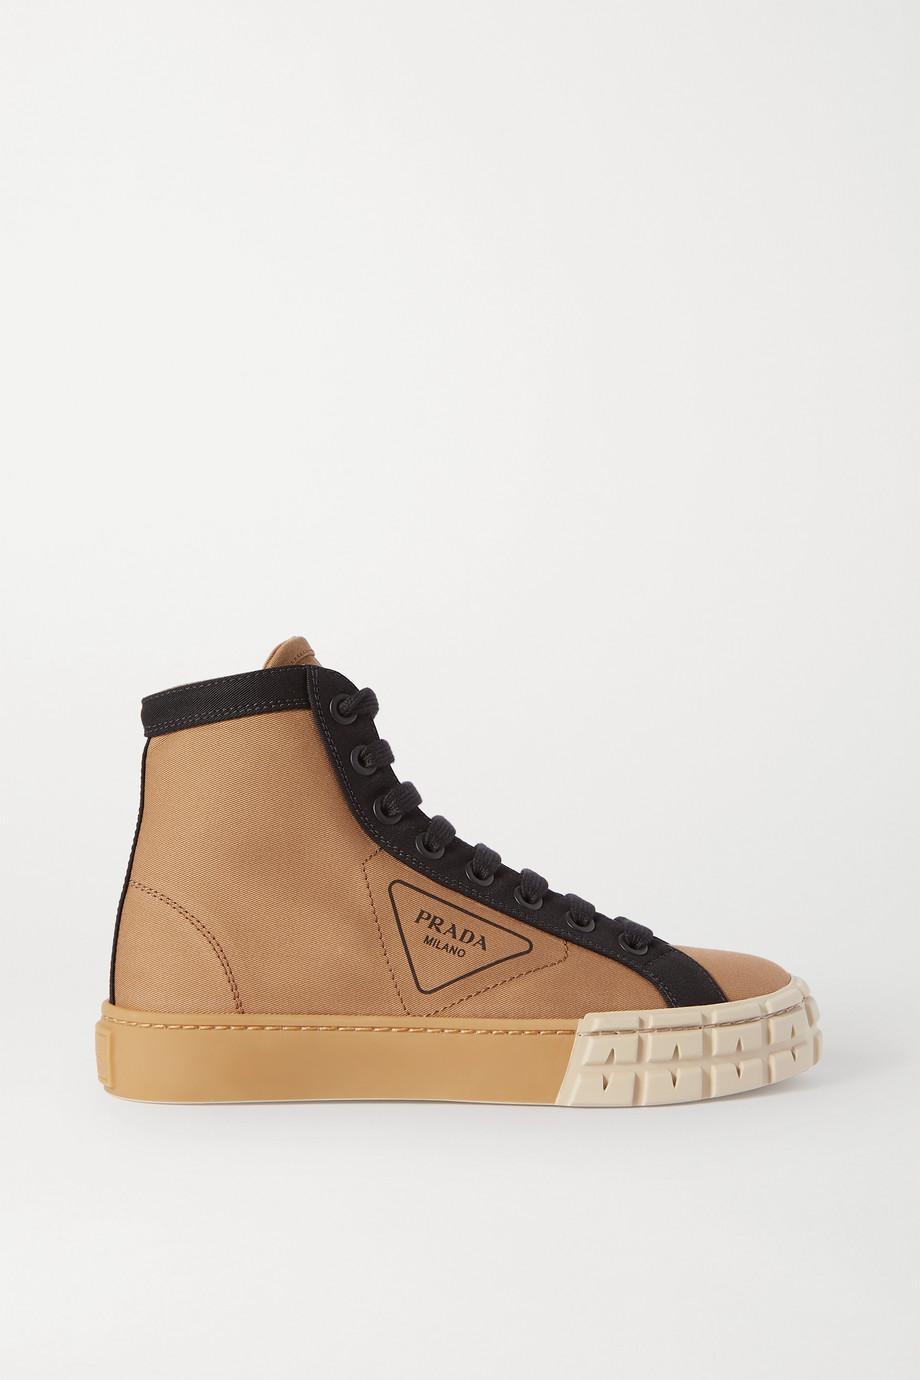 Prada Two-tone logo-print gabardine high-top sneakers